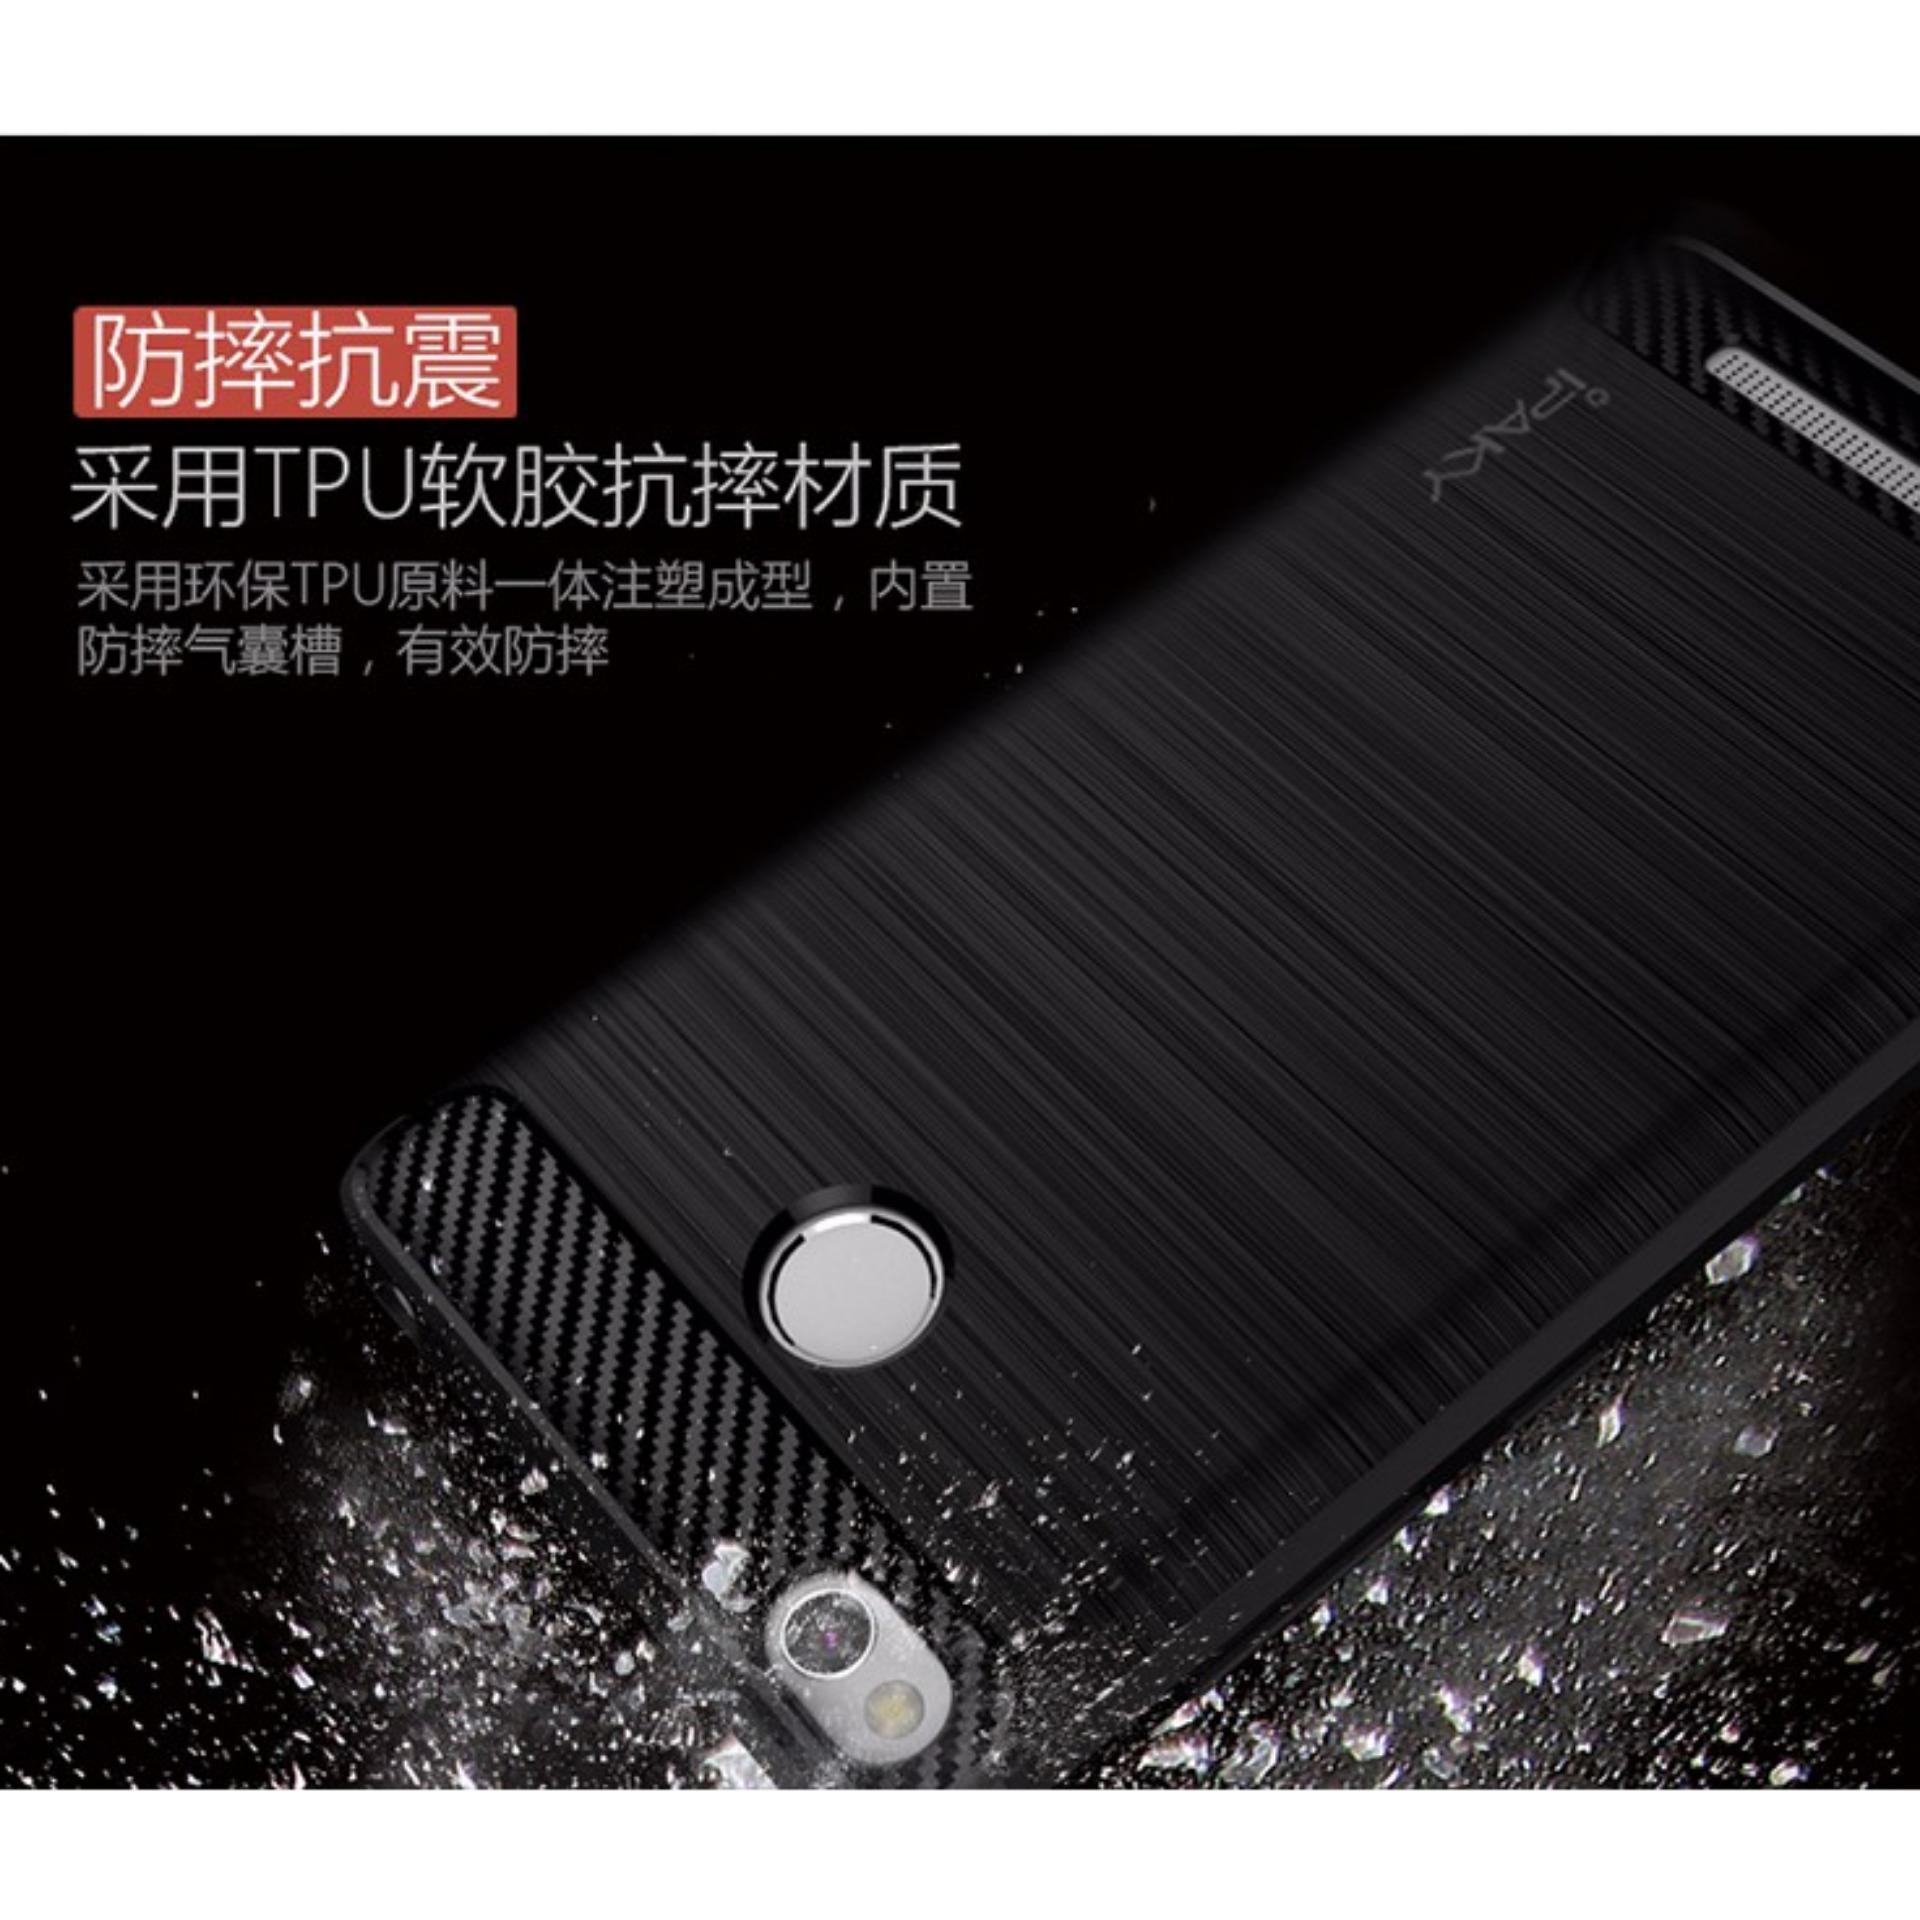 ... 4x Hitam Source · iPaky Carbon Fiber Shockproof Hybrid Back Case for Xiaomi Redmi 3 Pro 3s Prime